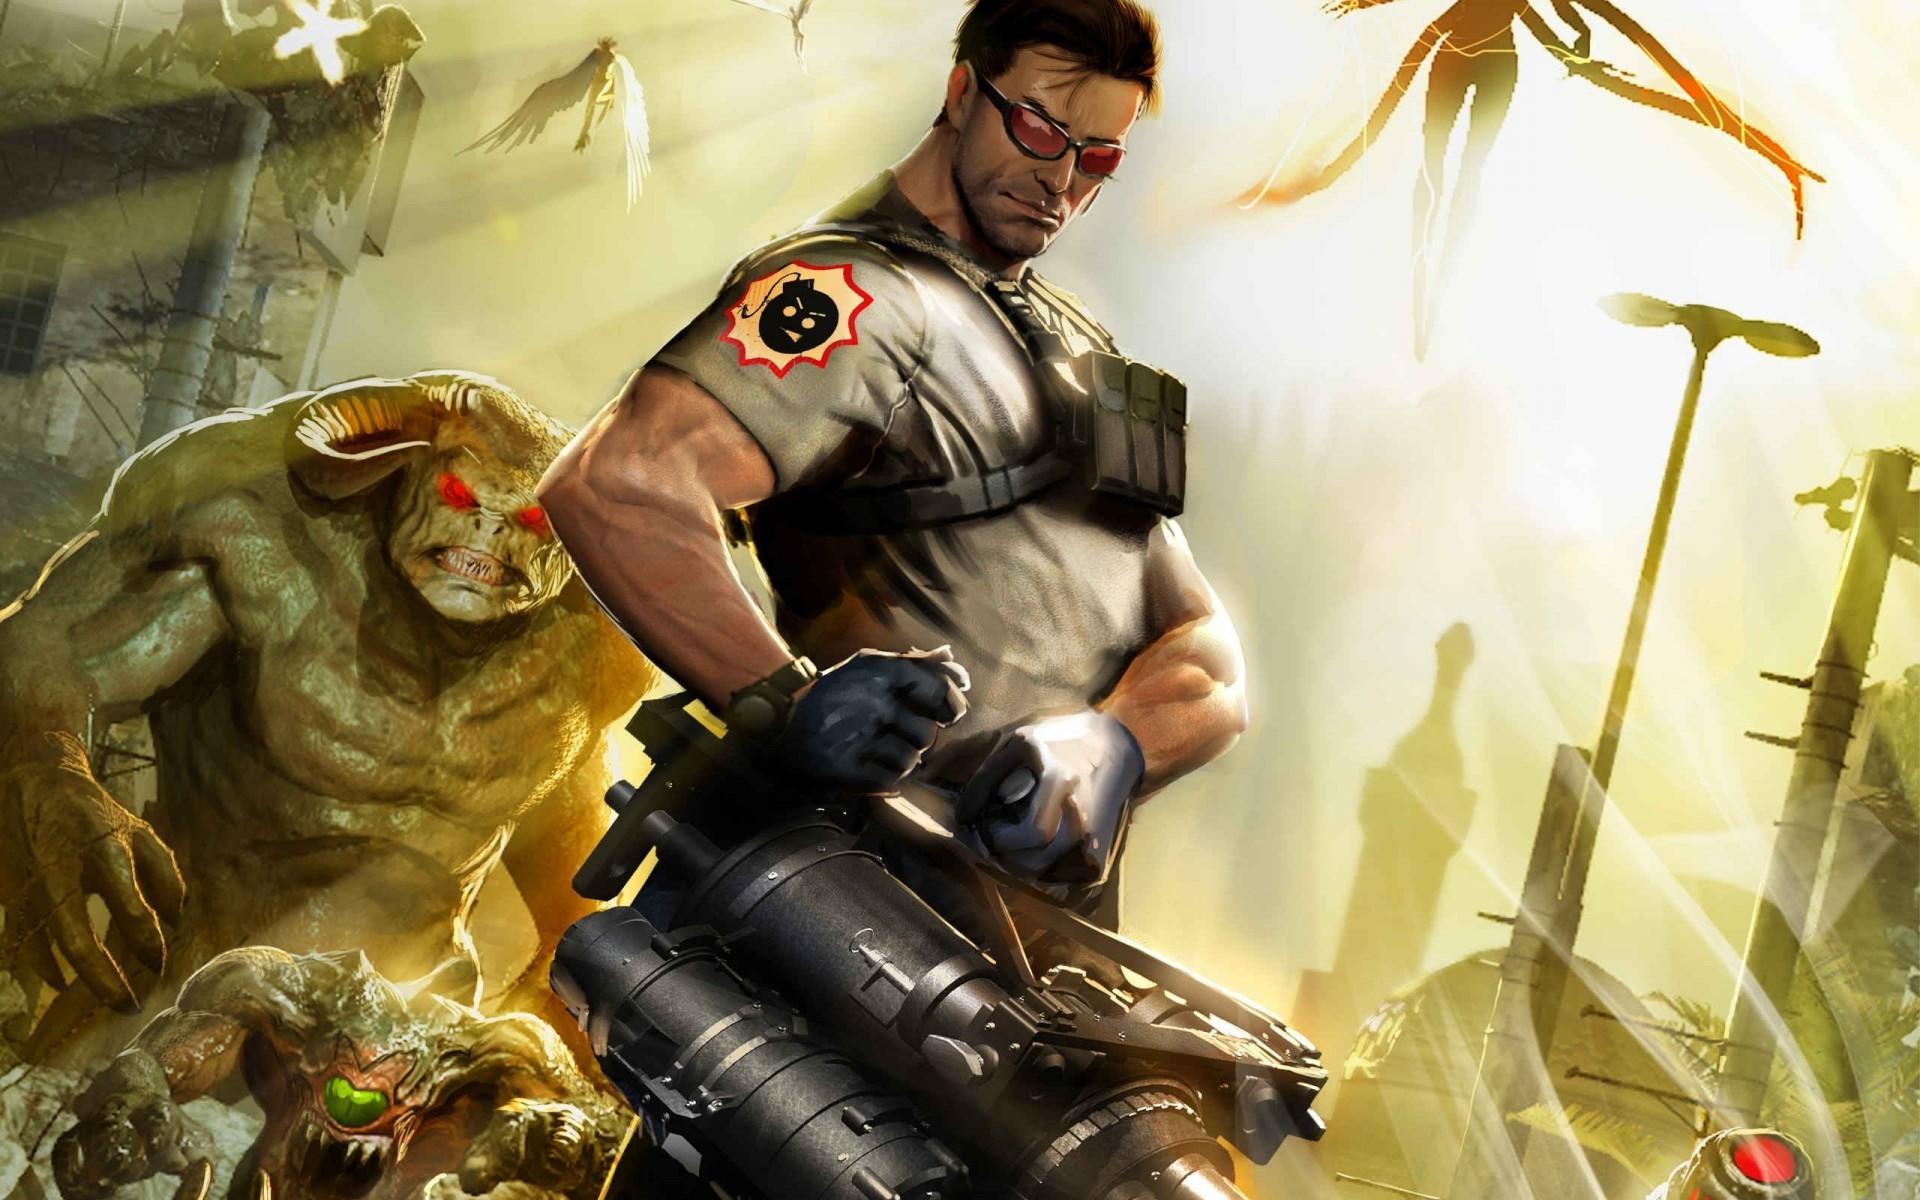 Арт к игре Serious Sam 3: BFE